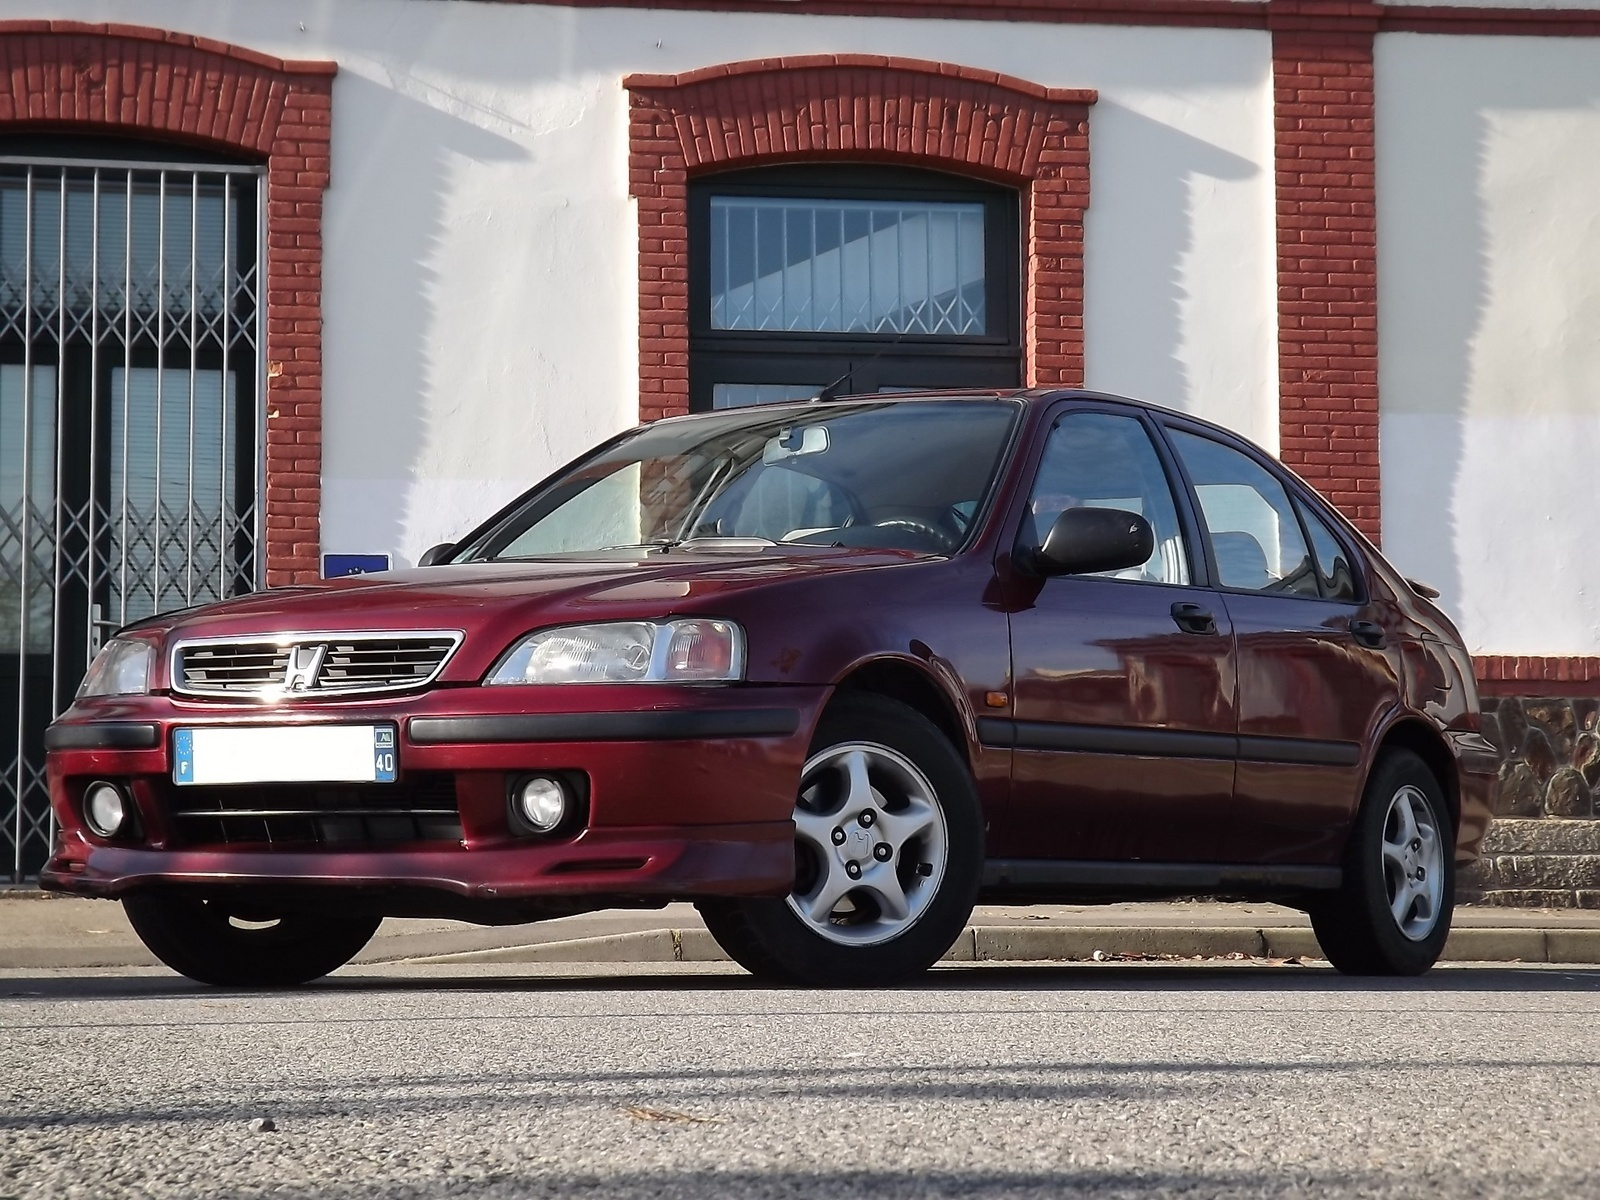 2000 Honda Civic Test Drive Review - CarGurus